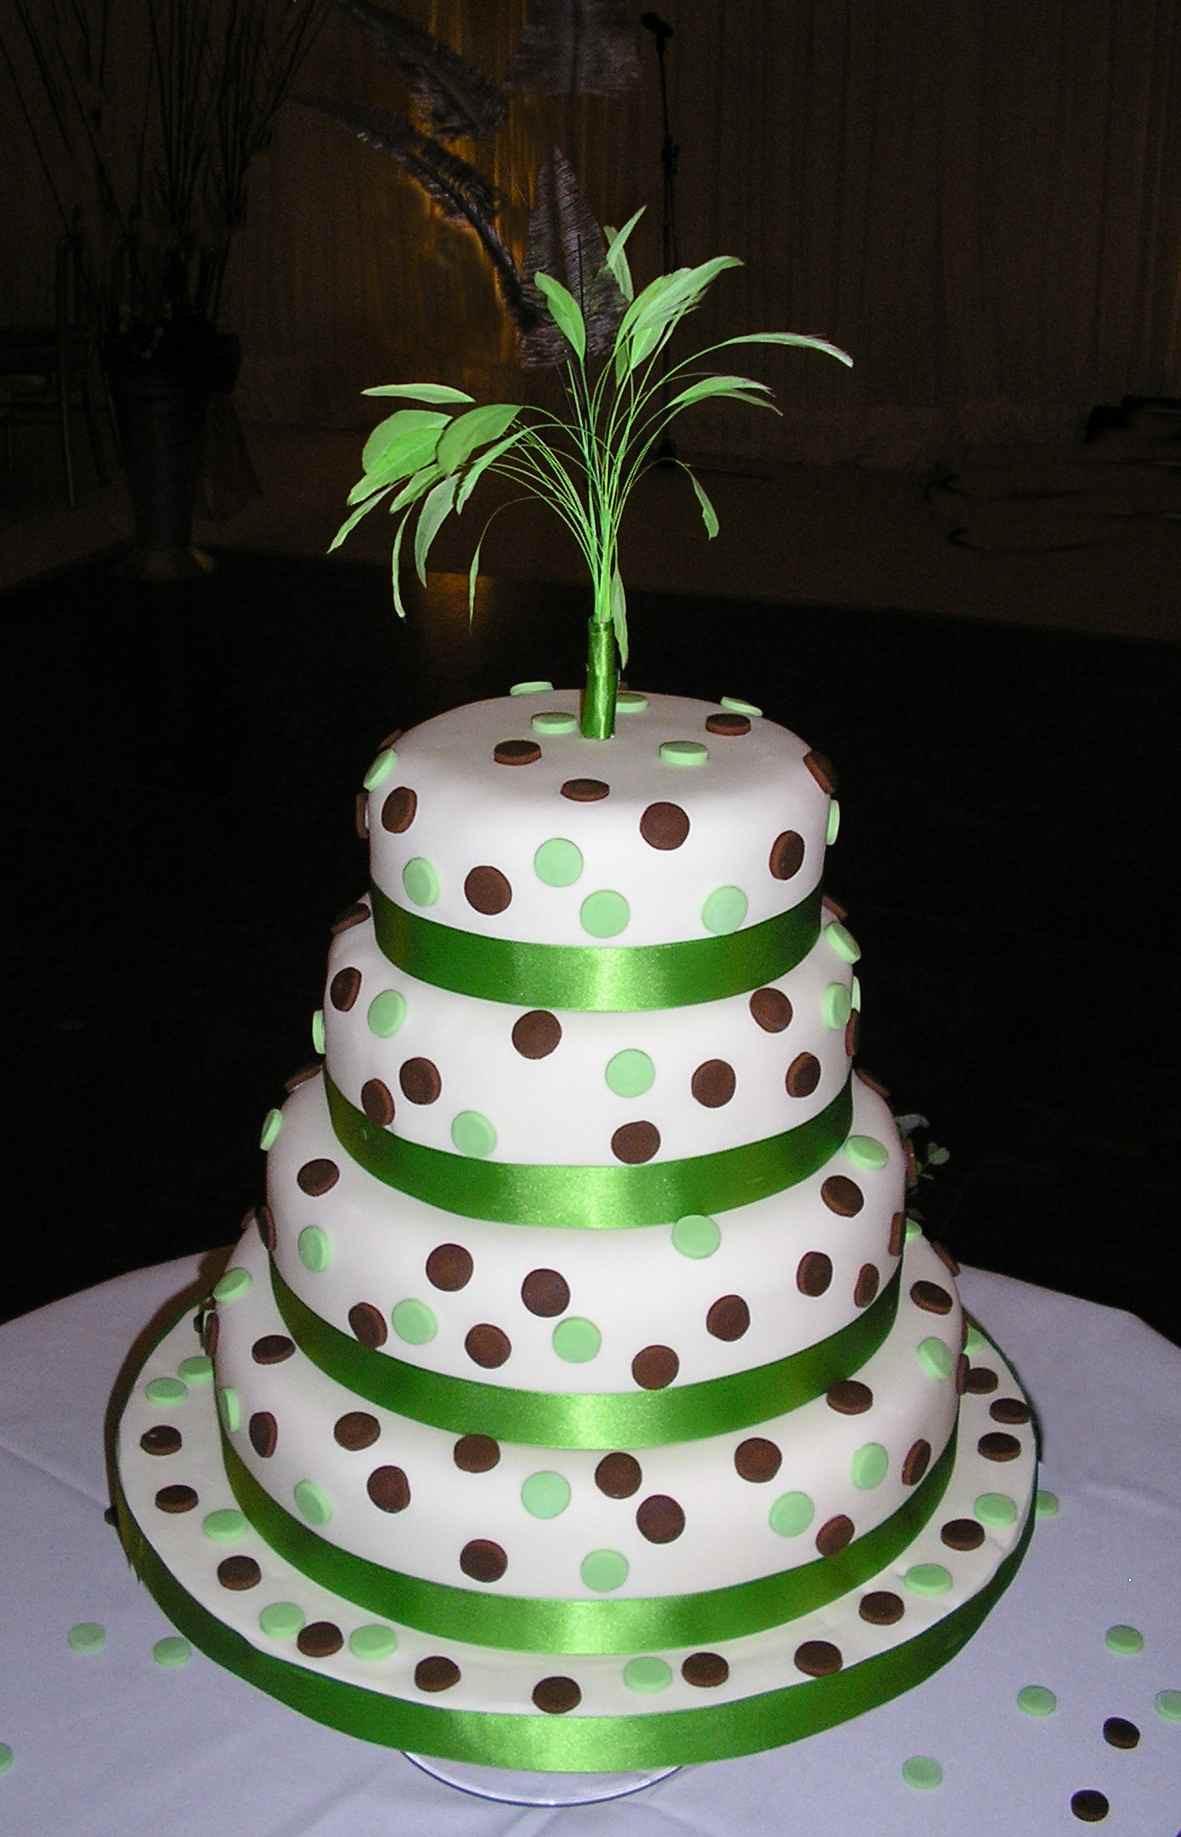 Polka Dotted Wedding Cakes  Polka Dot Cakes – Decoration Ideas